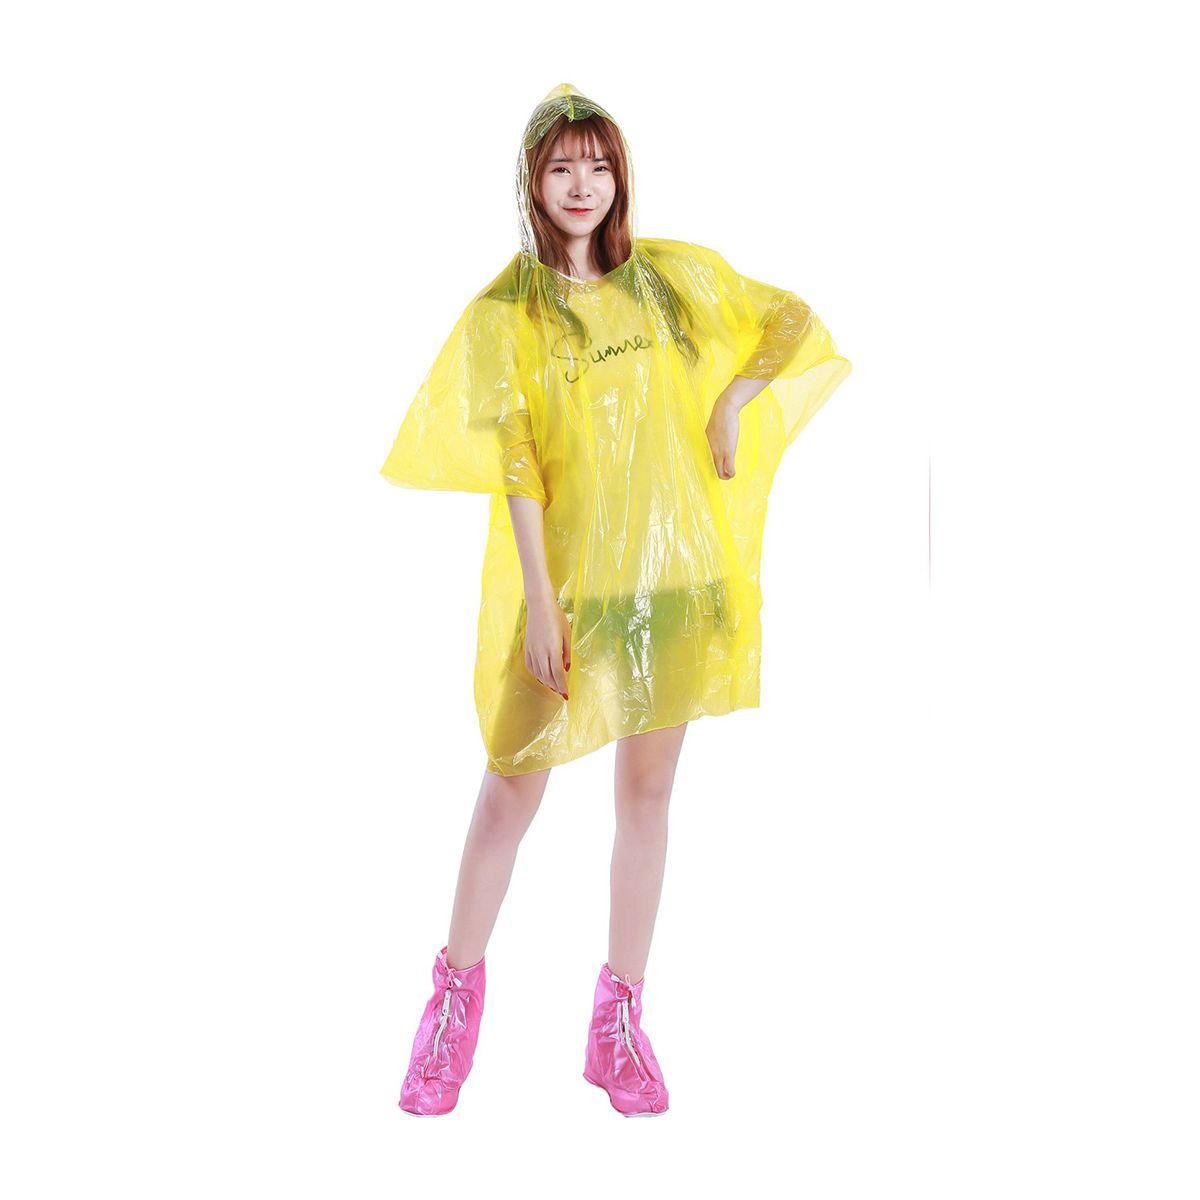 Nueva impermeables desechables impermeable capa de lluvia de las mujeres adultos con capucha largo poncho ropa impermeable color al aire libre Ramdon 2020